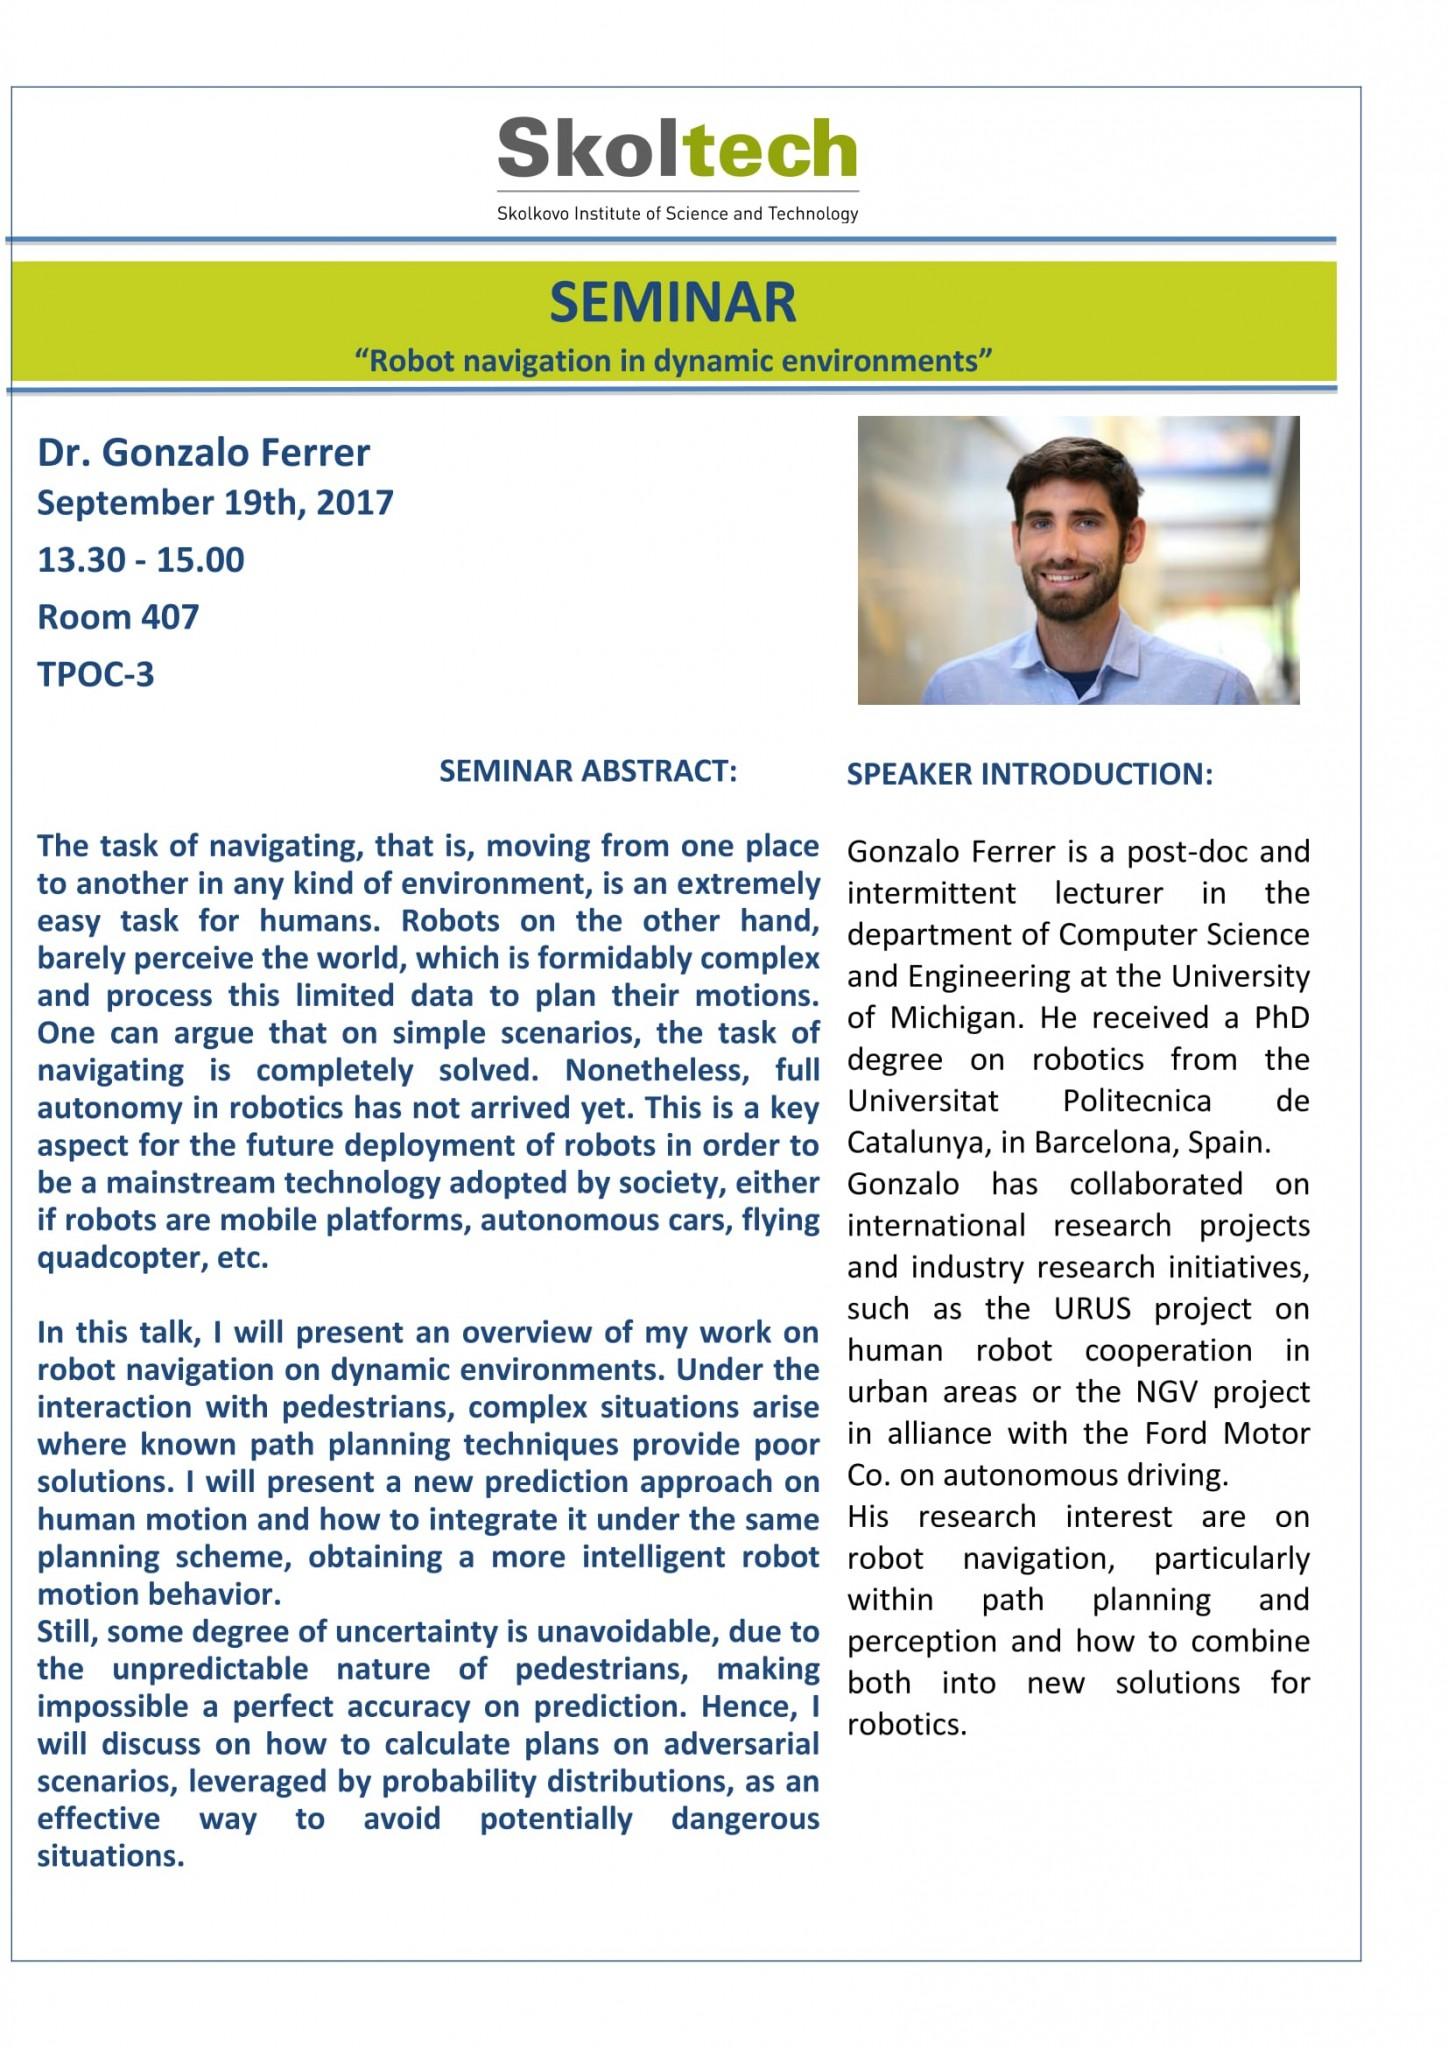 dr-gonzalo-ferrer-seminar-announcement-1